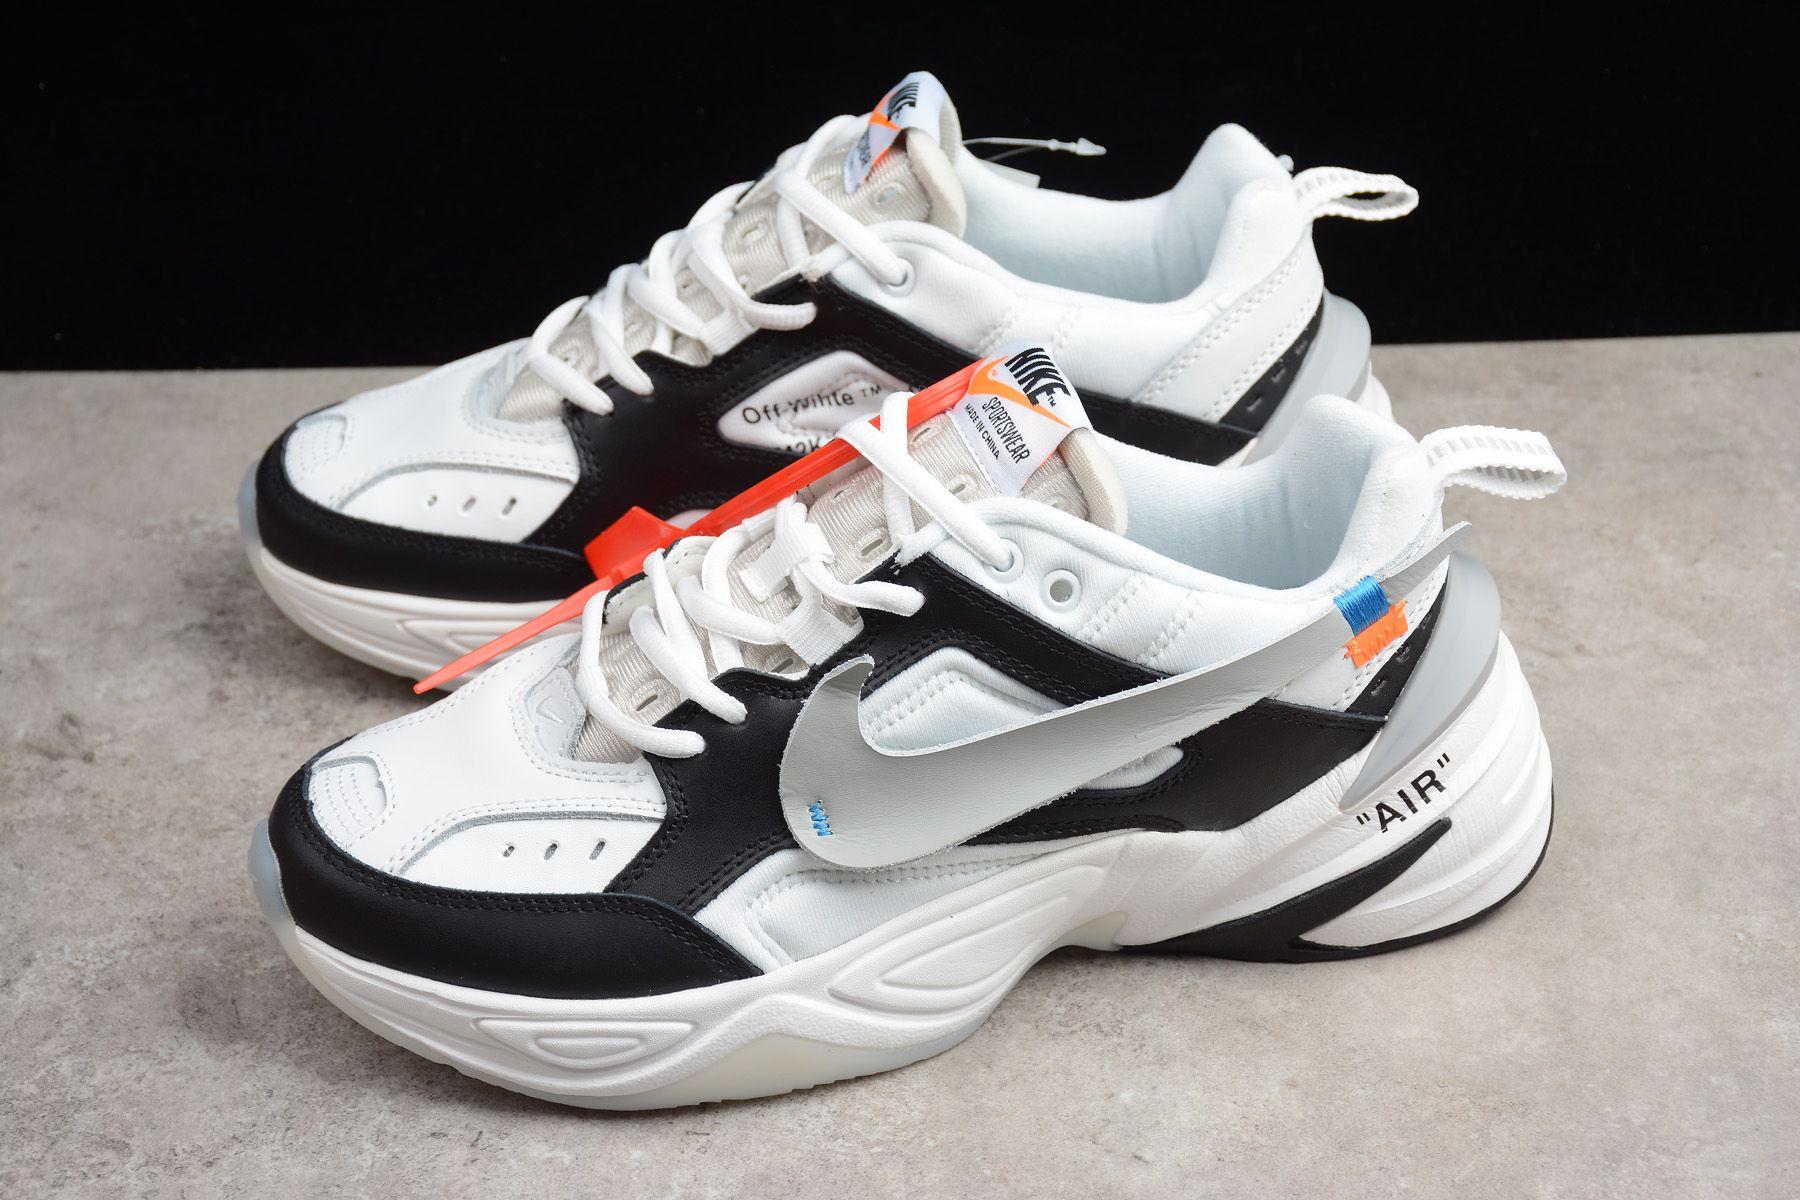 Nike And X 2018 Off M2k Men's Grey Women's White Blackwhite Kekno 0Nnwv8m